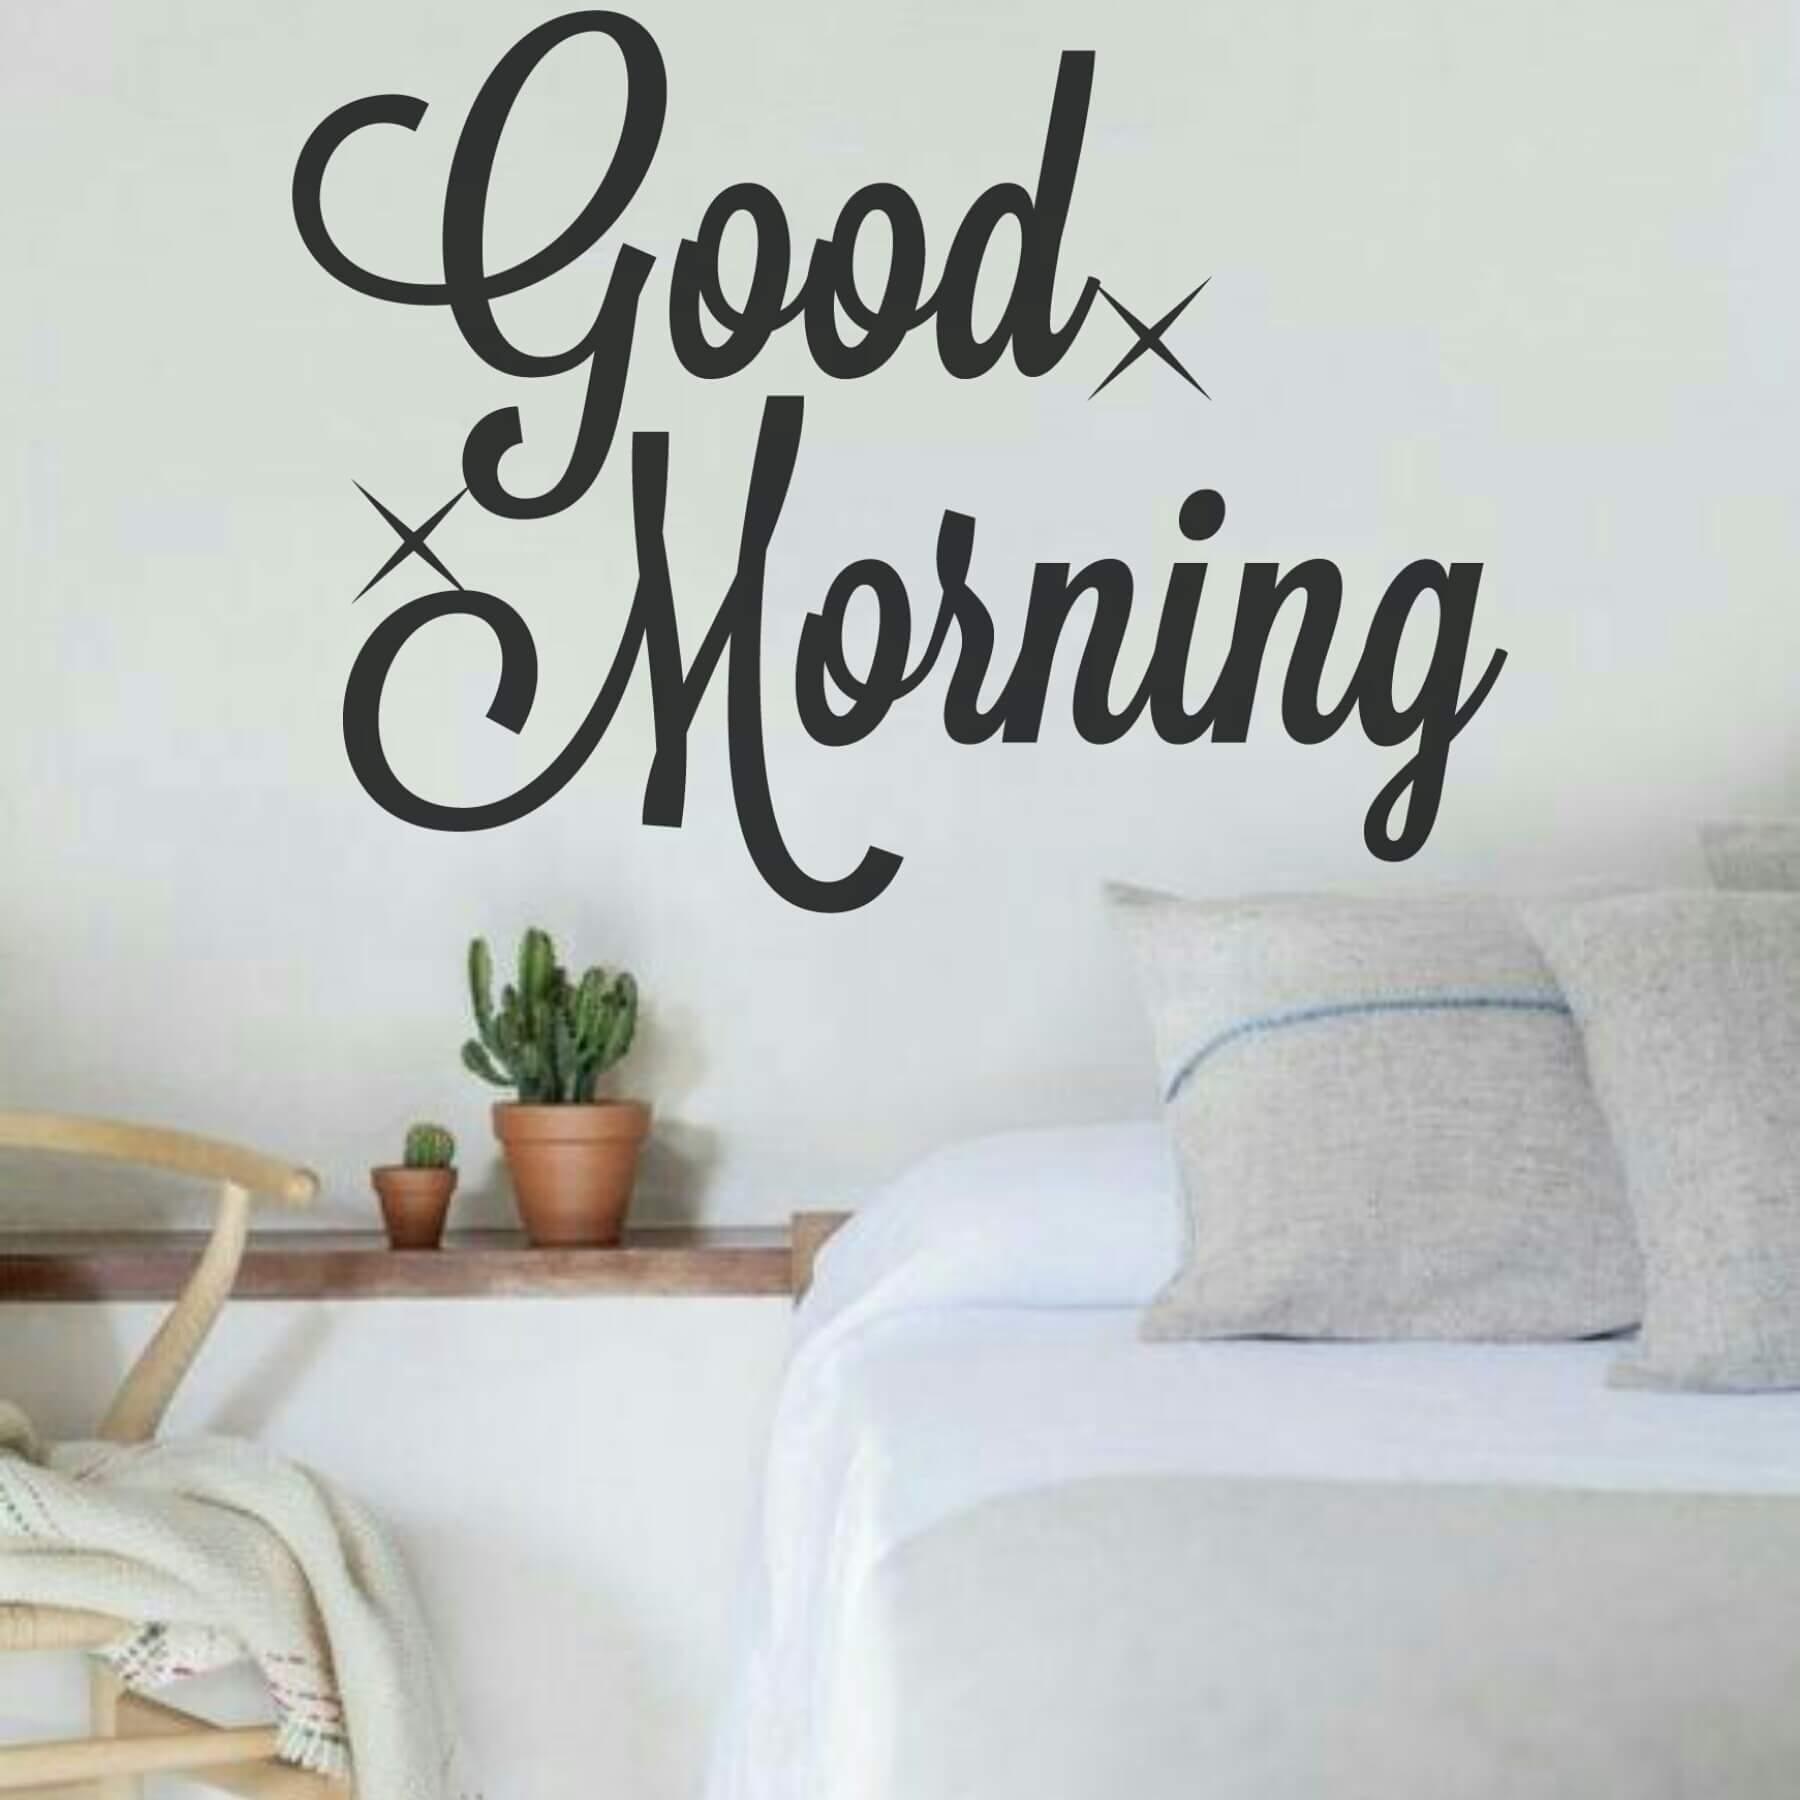 Good Morning 55 X 75cm Vinyl Wall Art